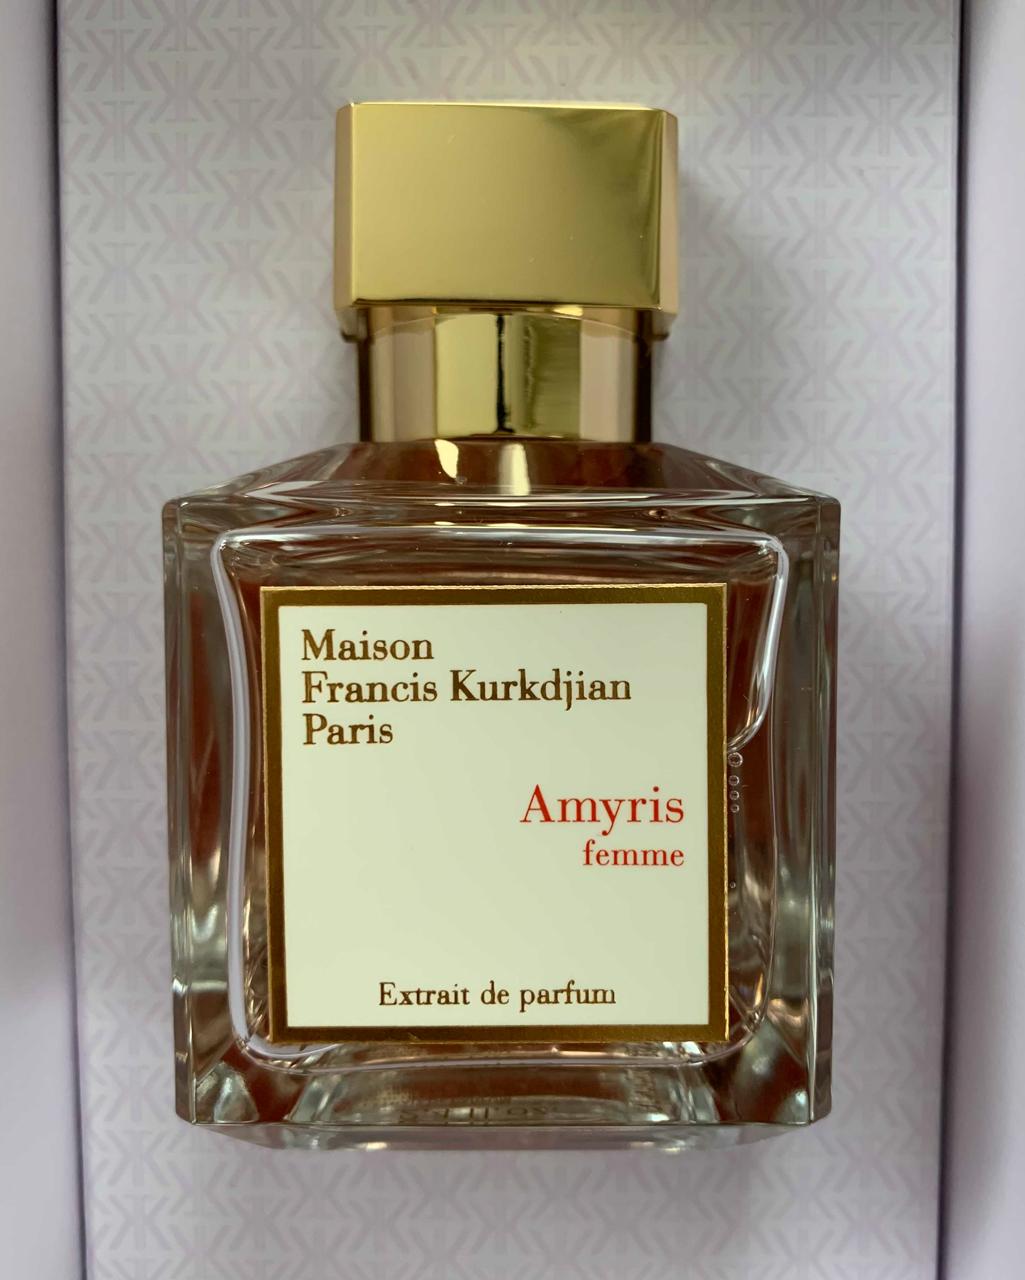 Maison Francisis Kurkdjian – Amyris Femme